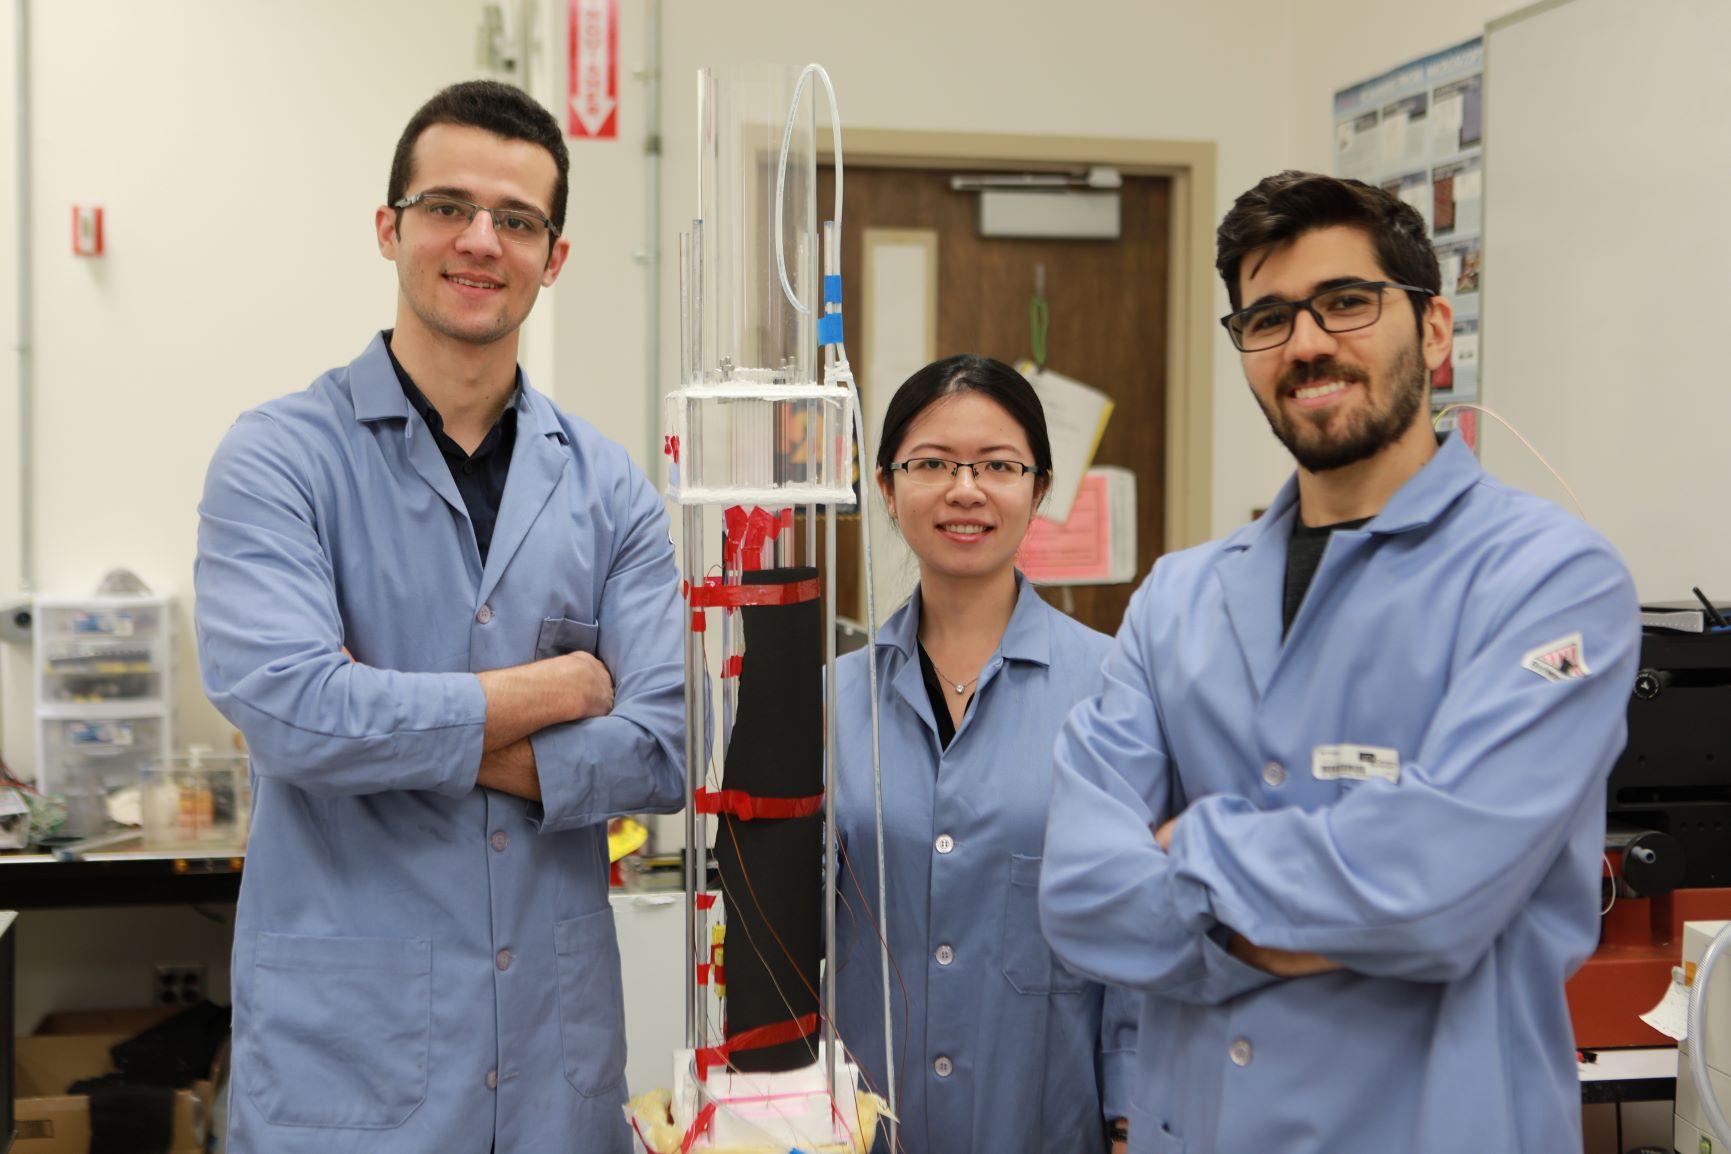 UCLA researchers (from left) Abolfazl Sadeghpour, Hangjie Ji and Navid Dehdari Ebrahimi with their experimental water capture apparatus / Photo credits: UCLA Newsroom